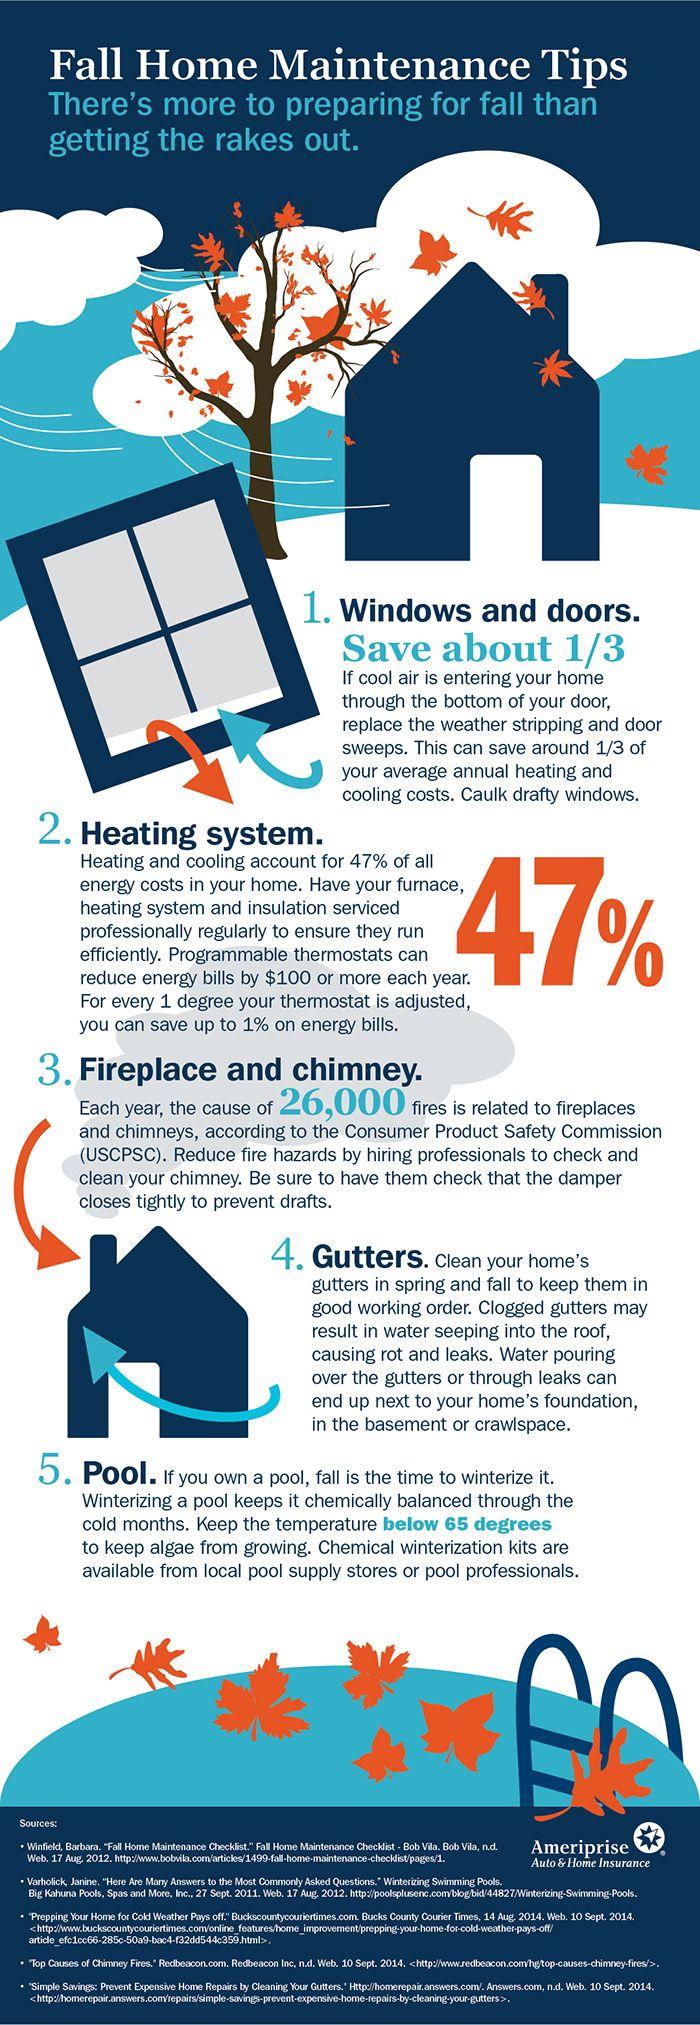 Fall Home Maintenance Tips Home Maintenance Autumn Home Maintenance